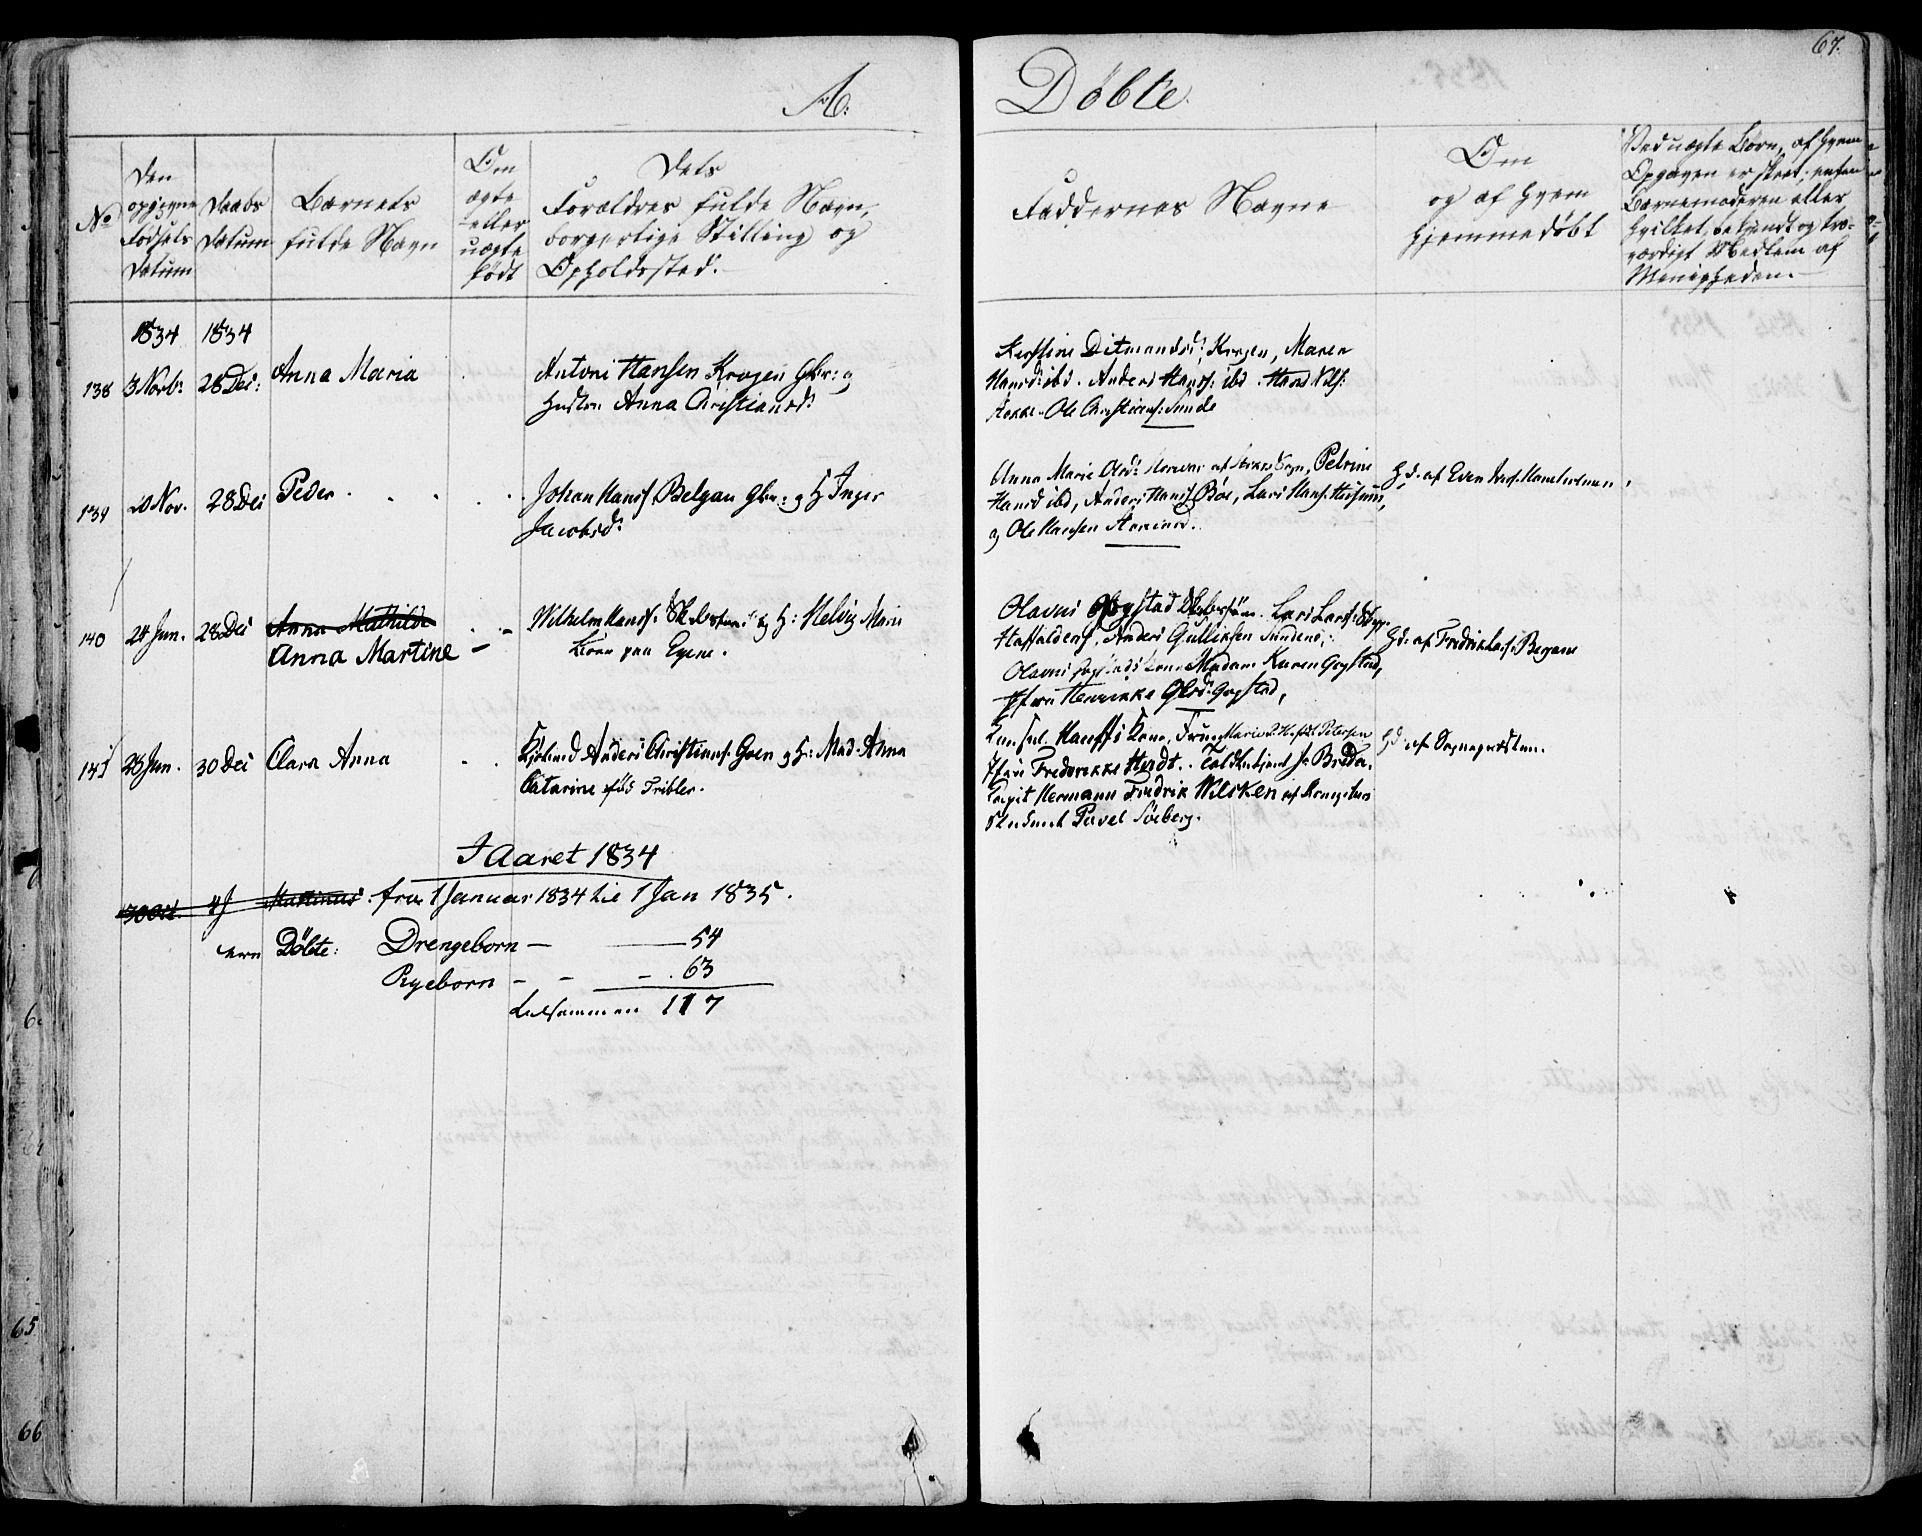 SAKO, Sandar kirkebøker, F/Fa/L0005: Parish register (official) no. 5, 1832-1847, p. 66-67